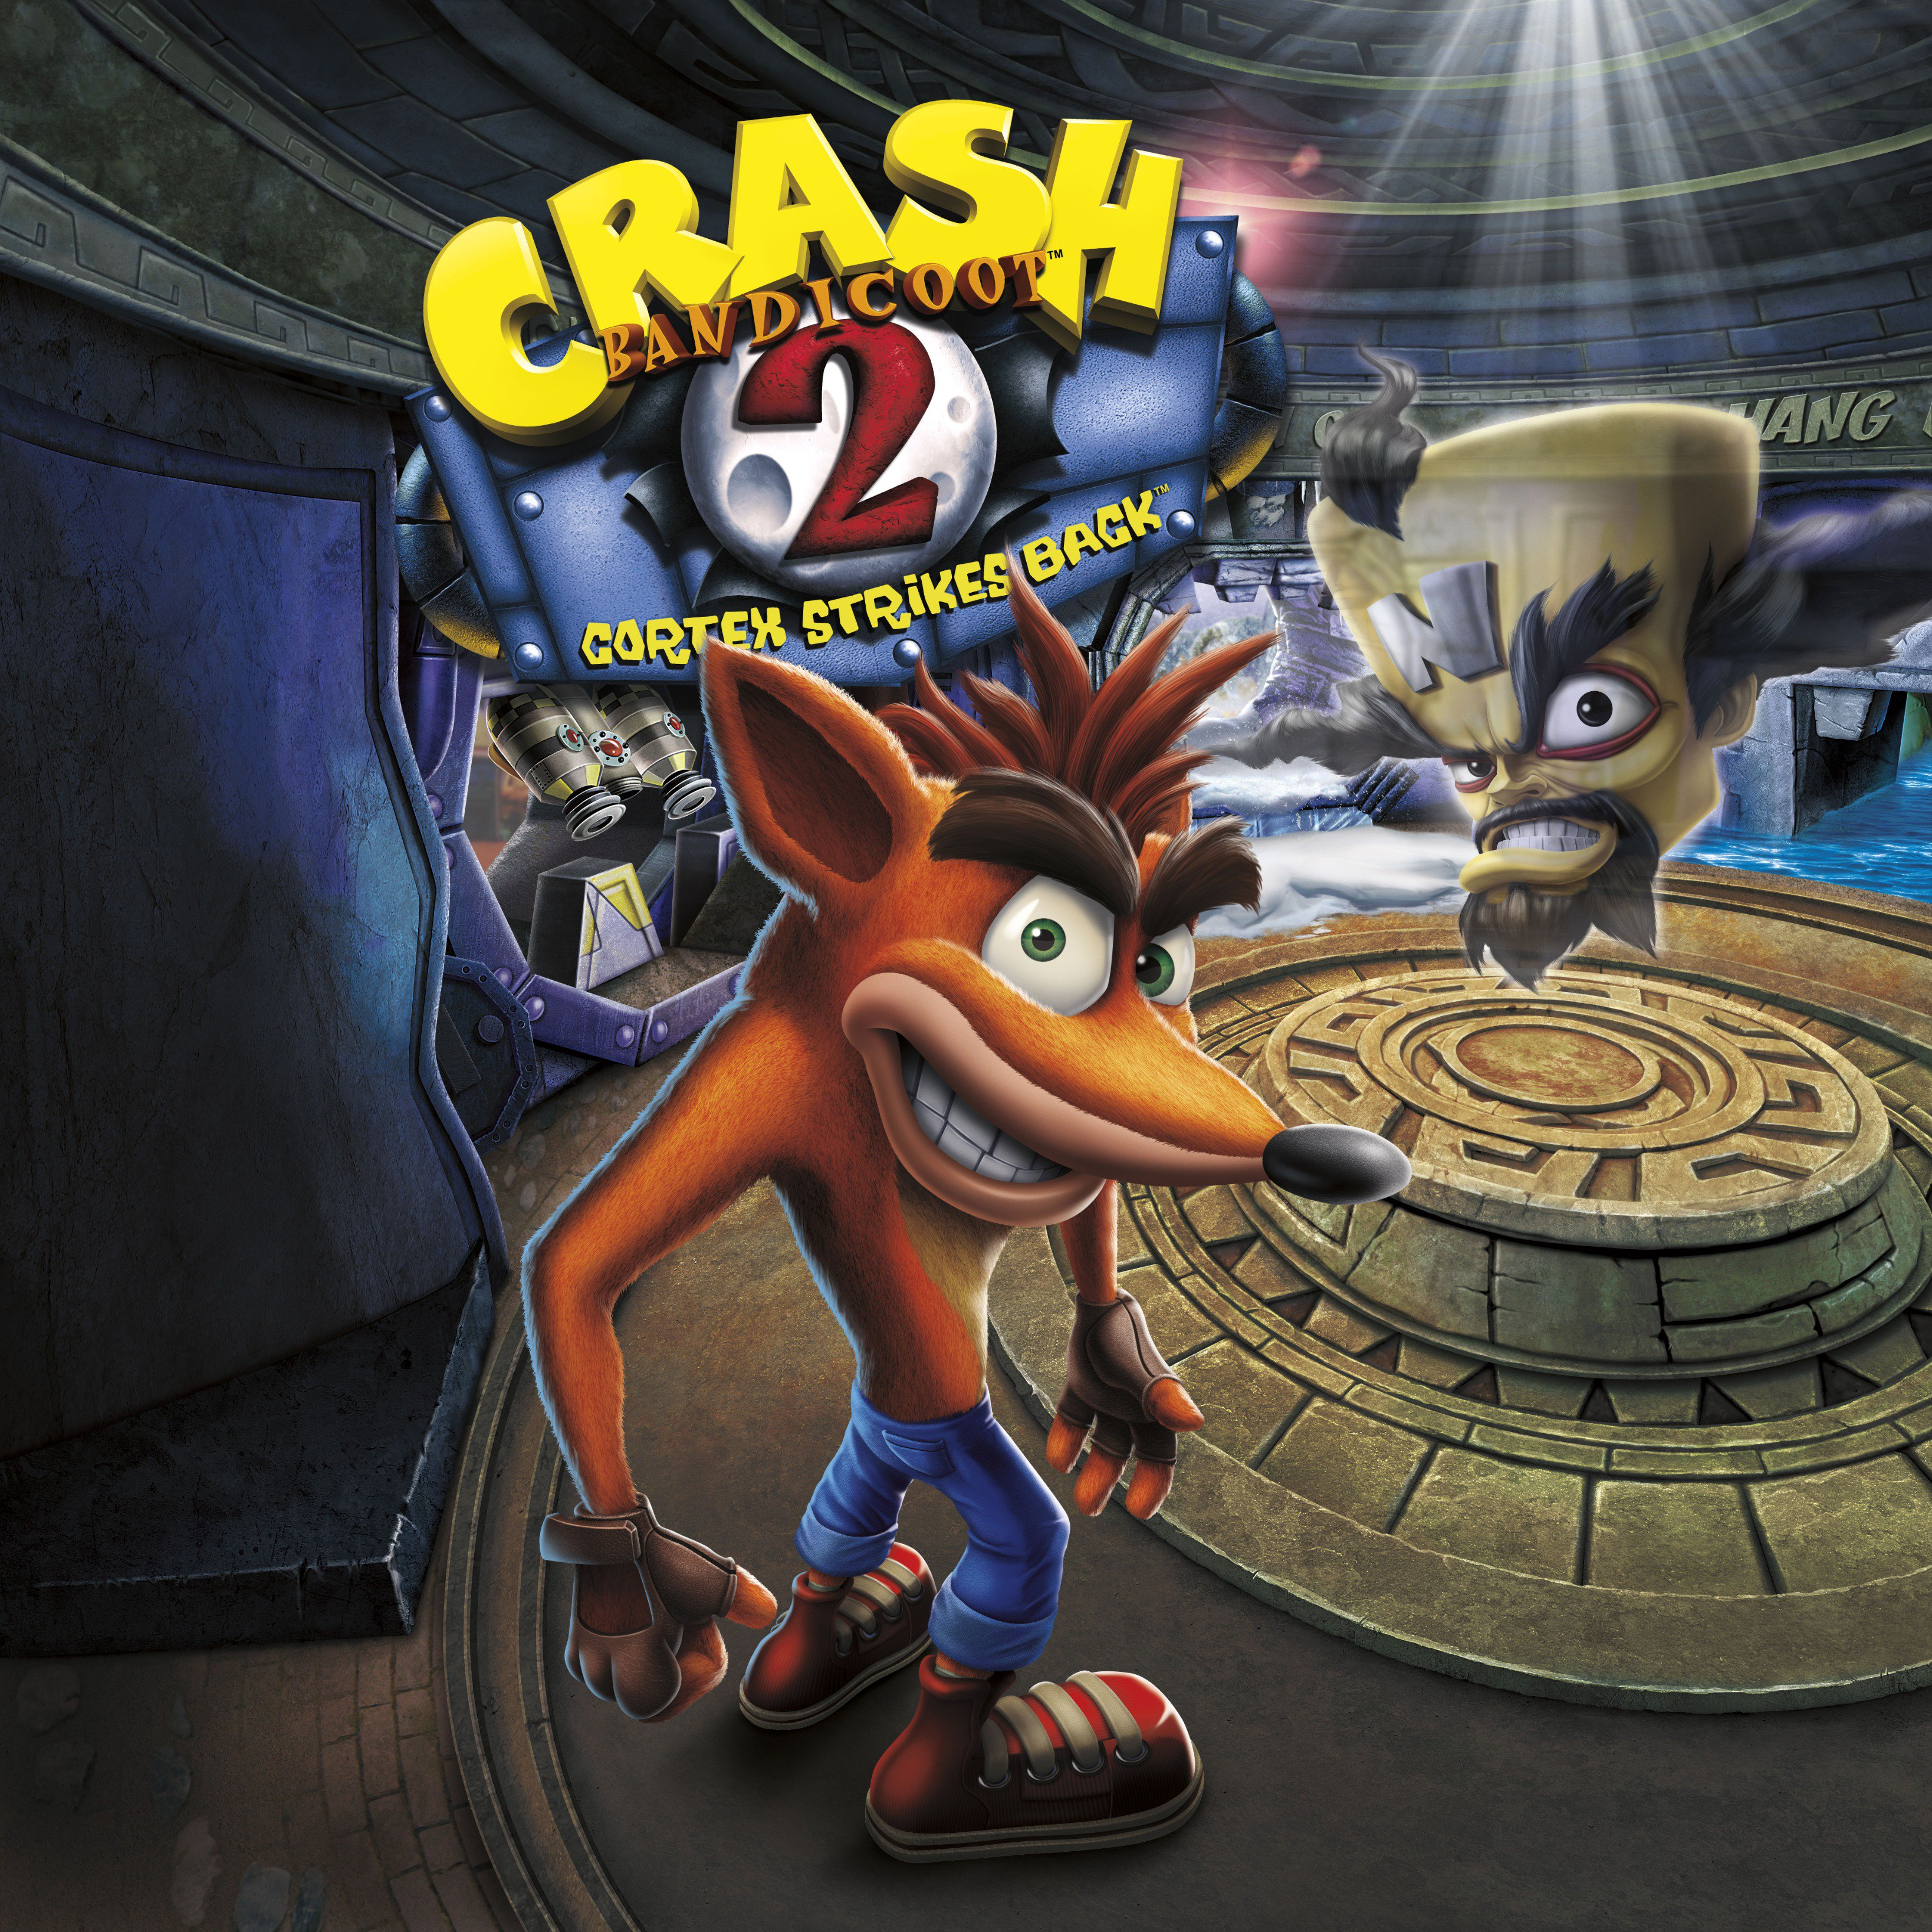 Crash Bandicoot N. Sane Trilogy - Crash Bandicoot N. Sane Trilogy Арт